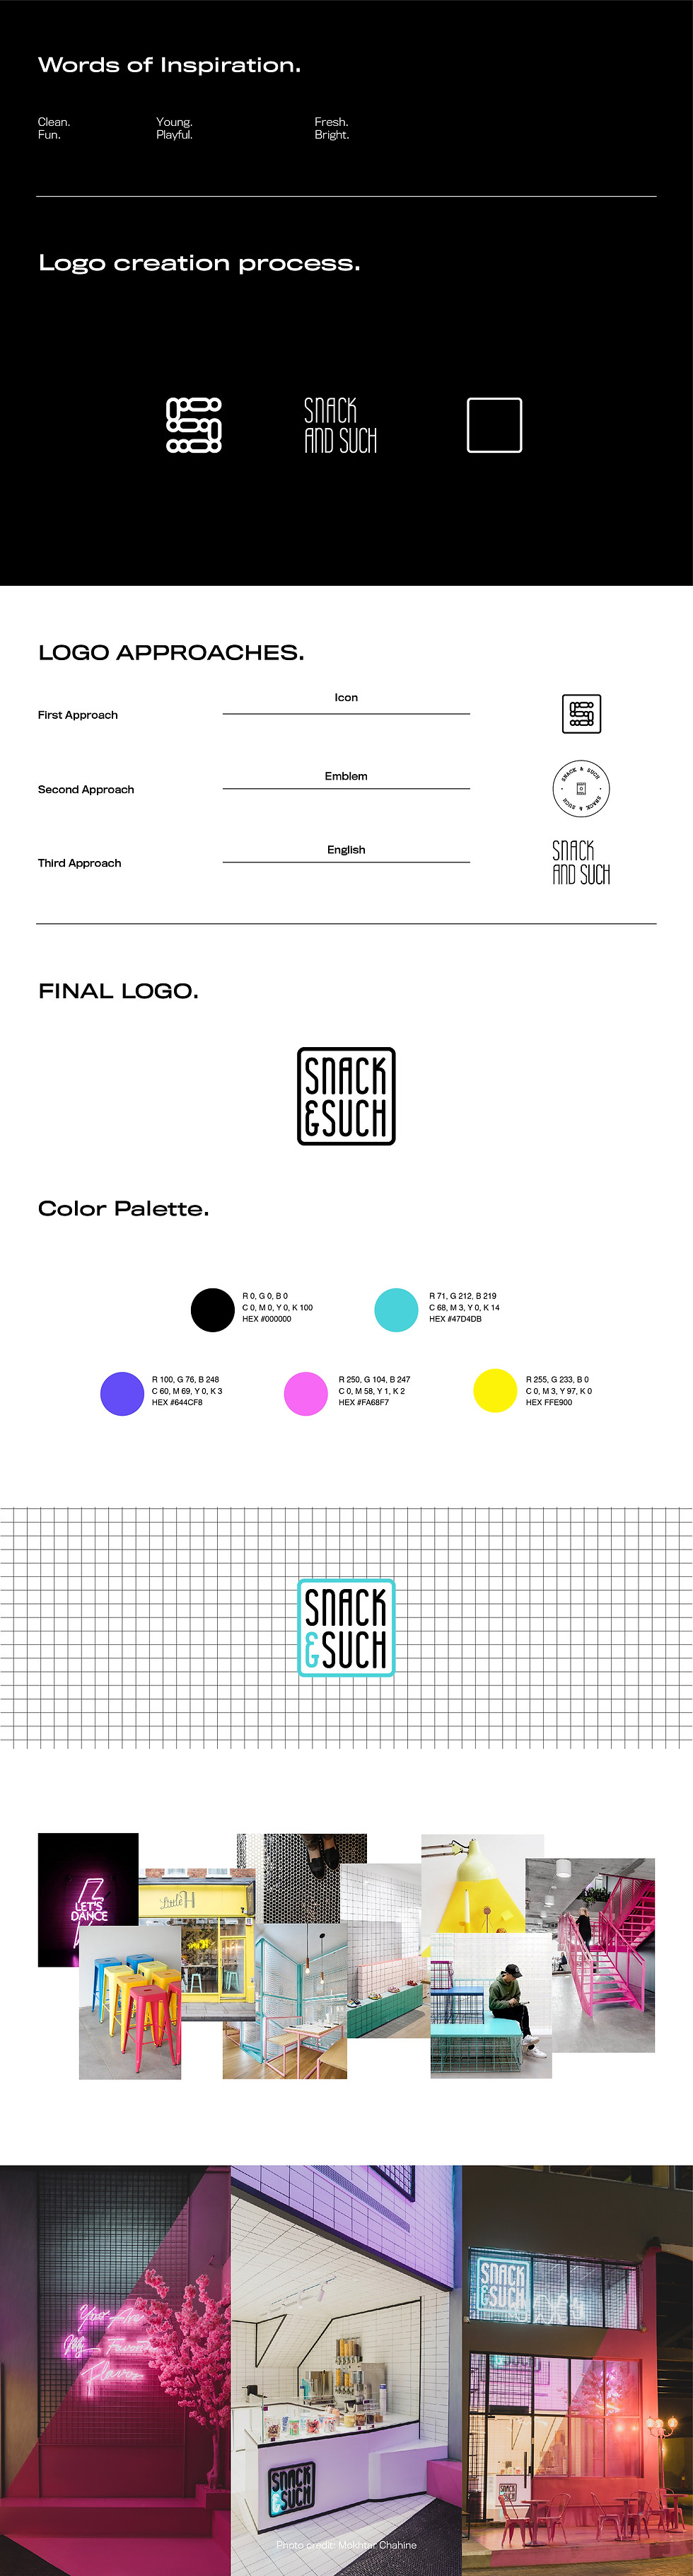 Snack & Such | Process-01.jpg